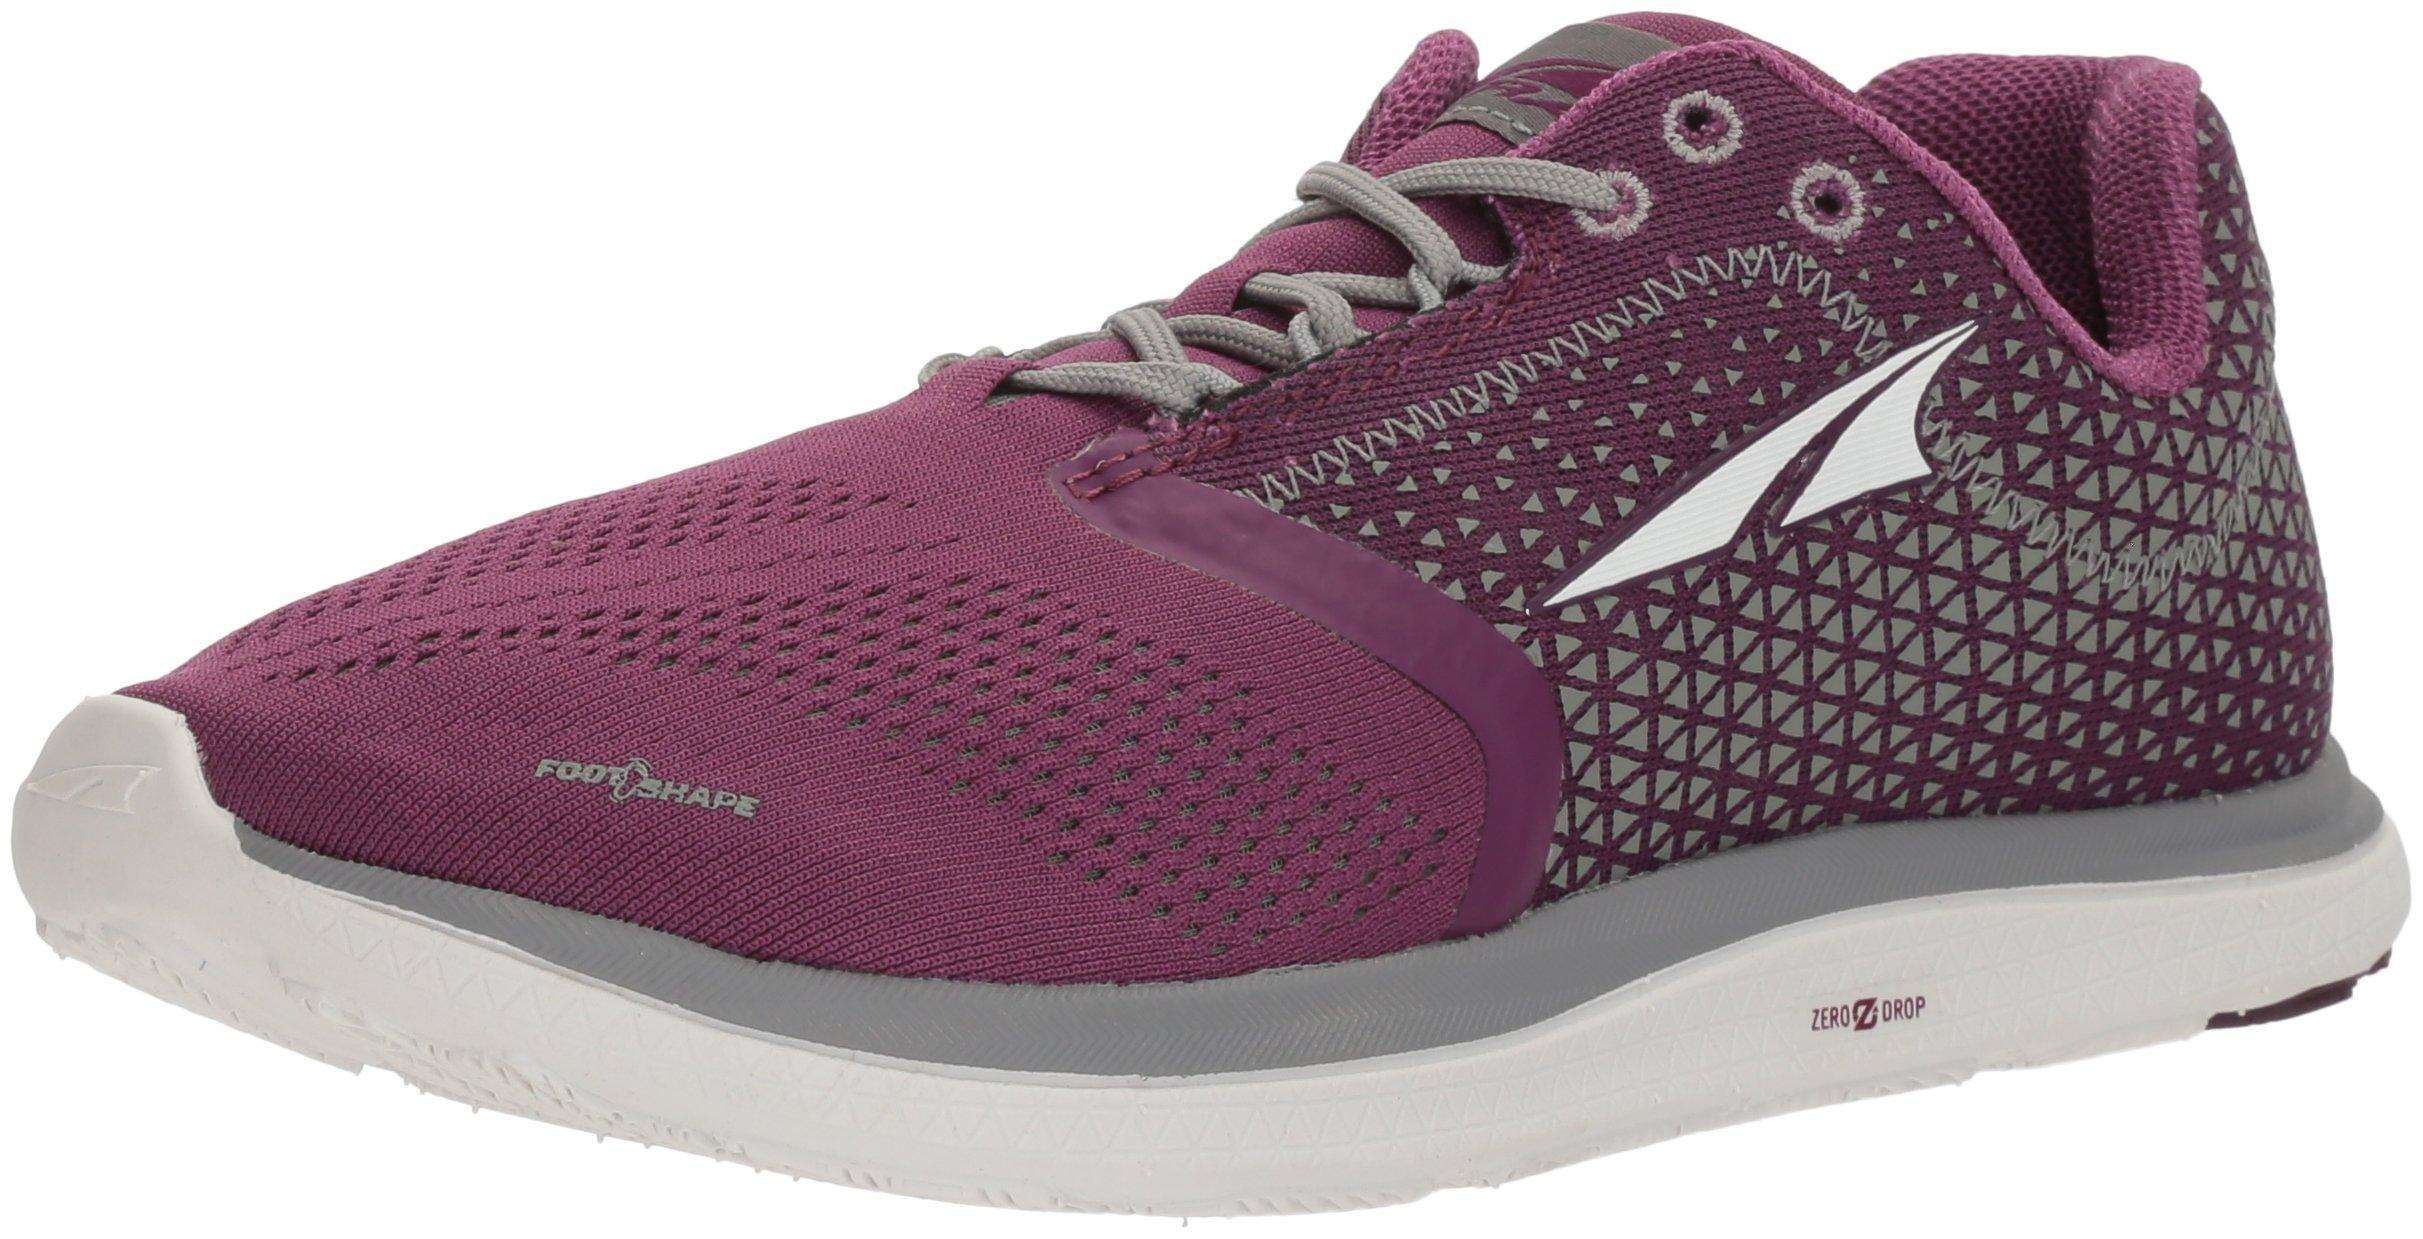 Altra Women's Solstice Sneaker, Purple, 5.5 Regular US by Altra (Image #1)